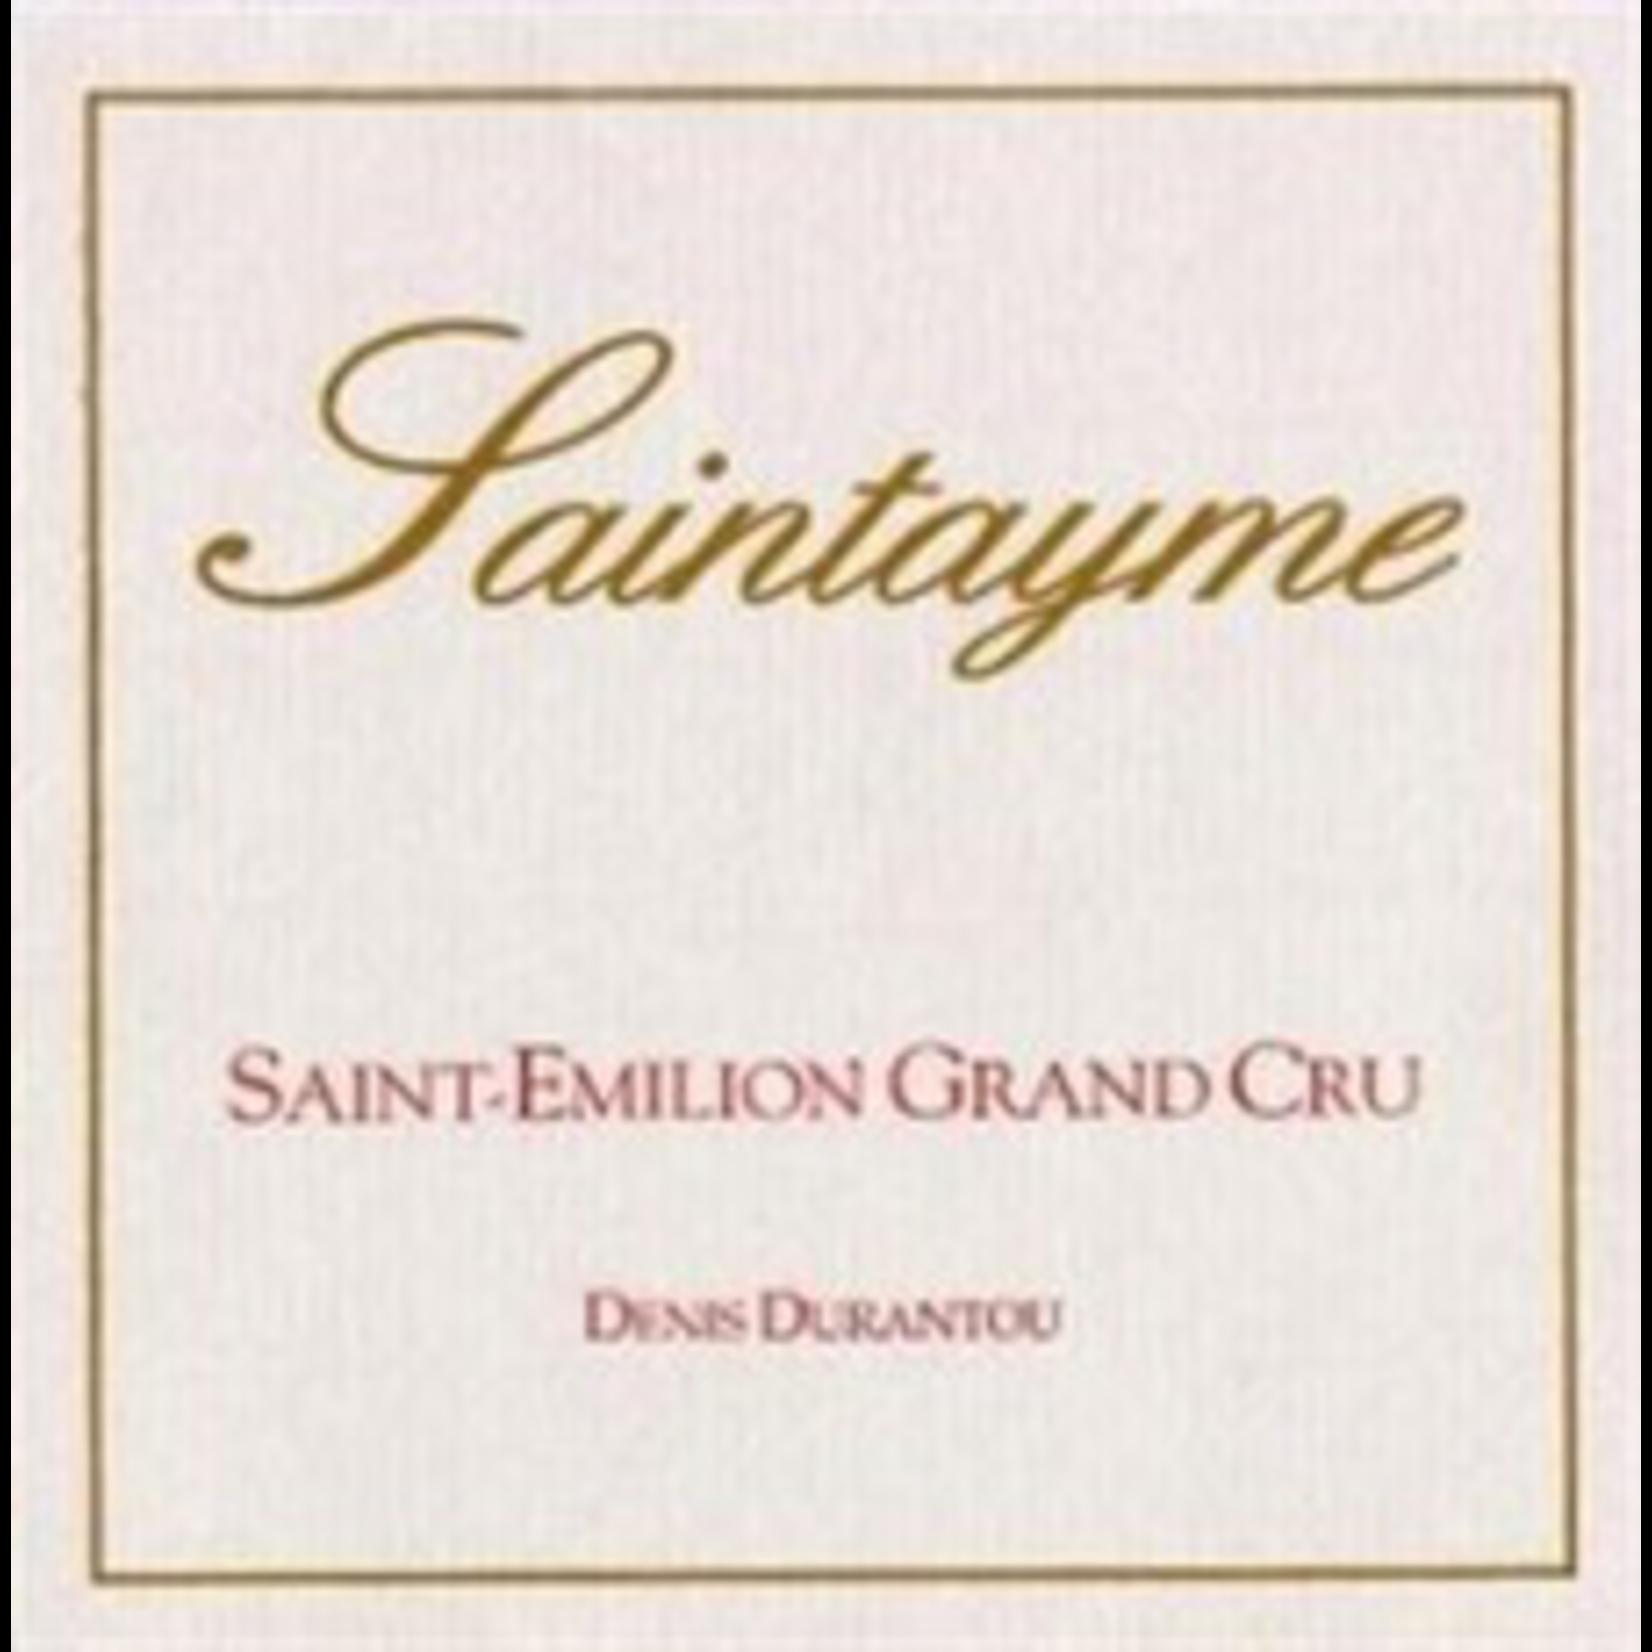 Wine Ch Saintayme 2018